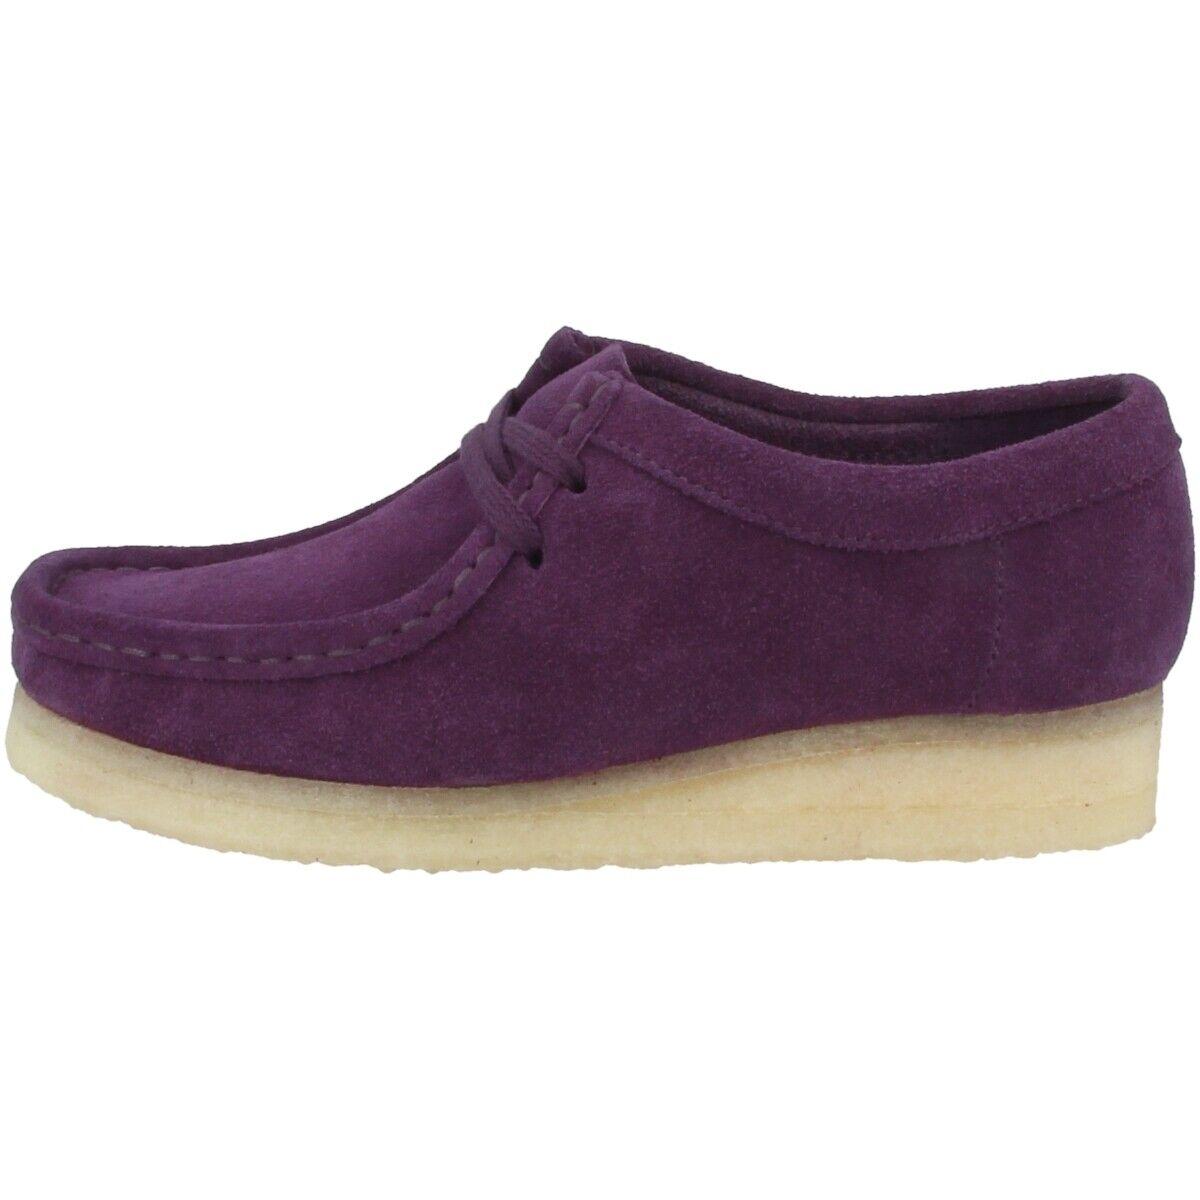 Clarks Wallabee damen Schuhe Damen Halbschuhe Schnürschuhe lila suede 26143815